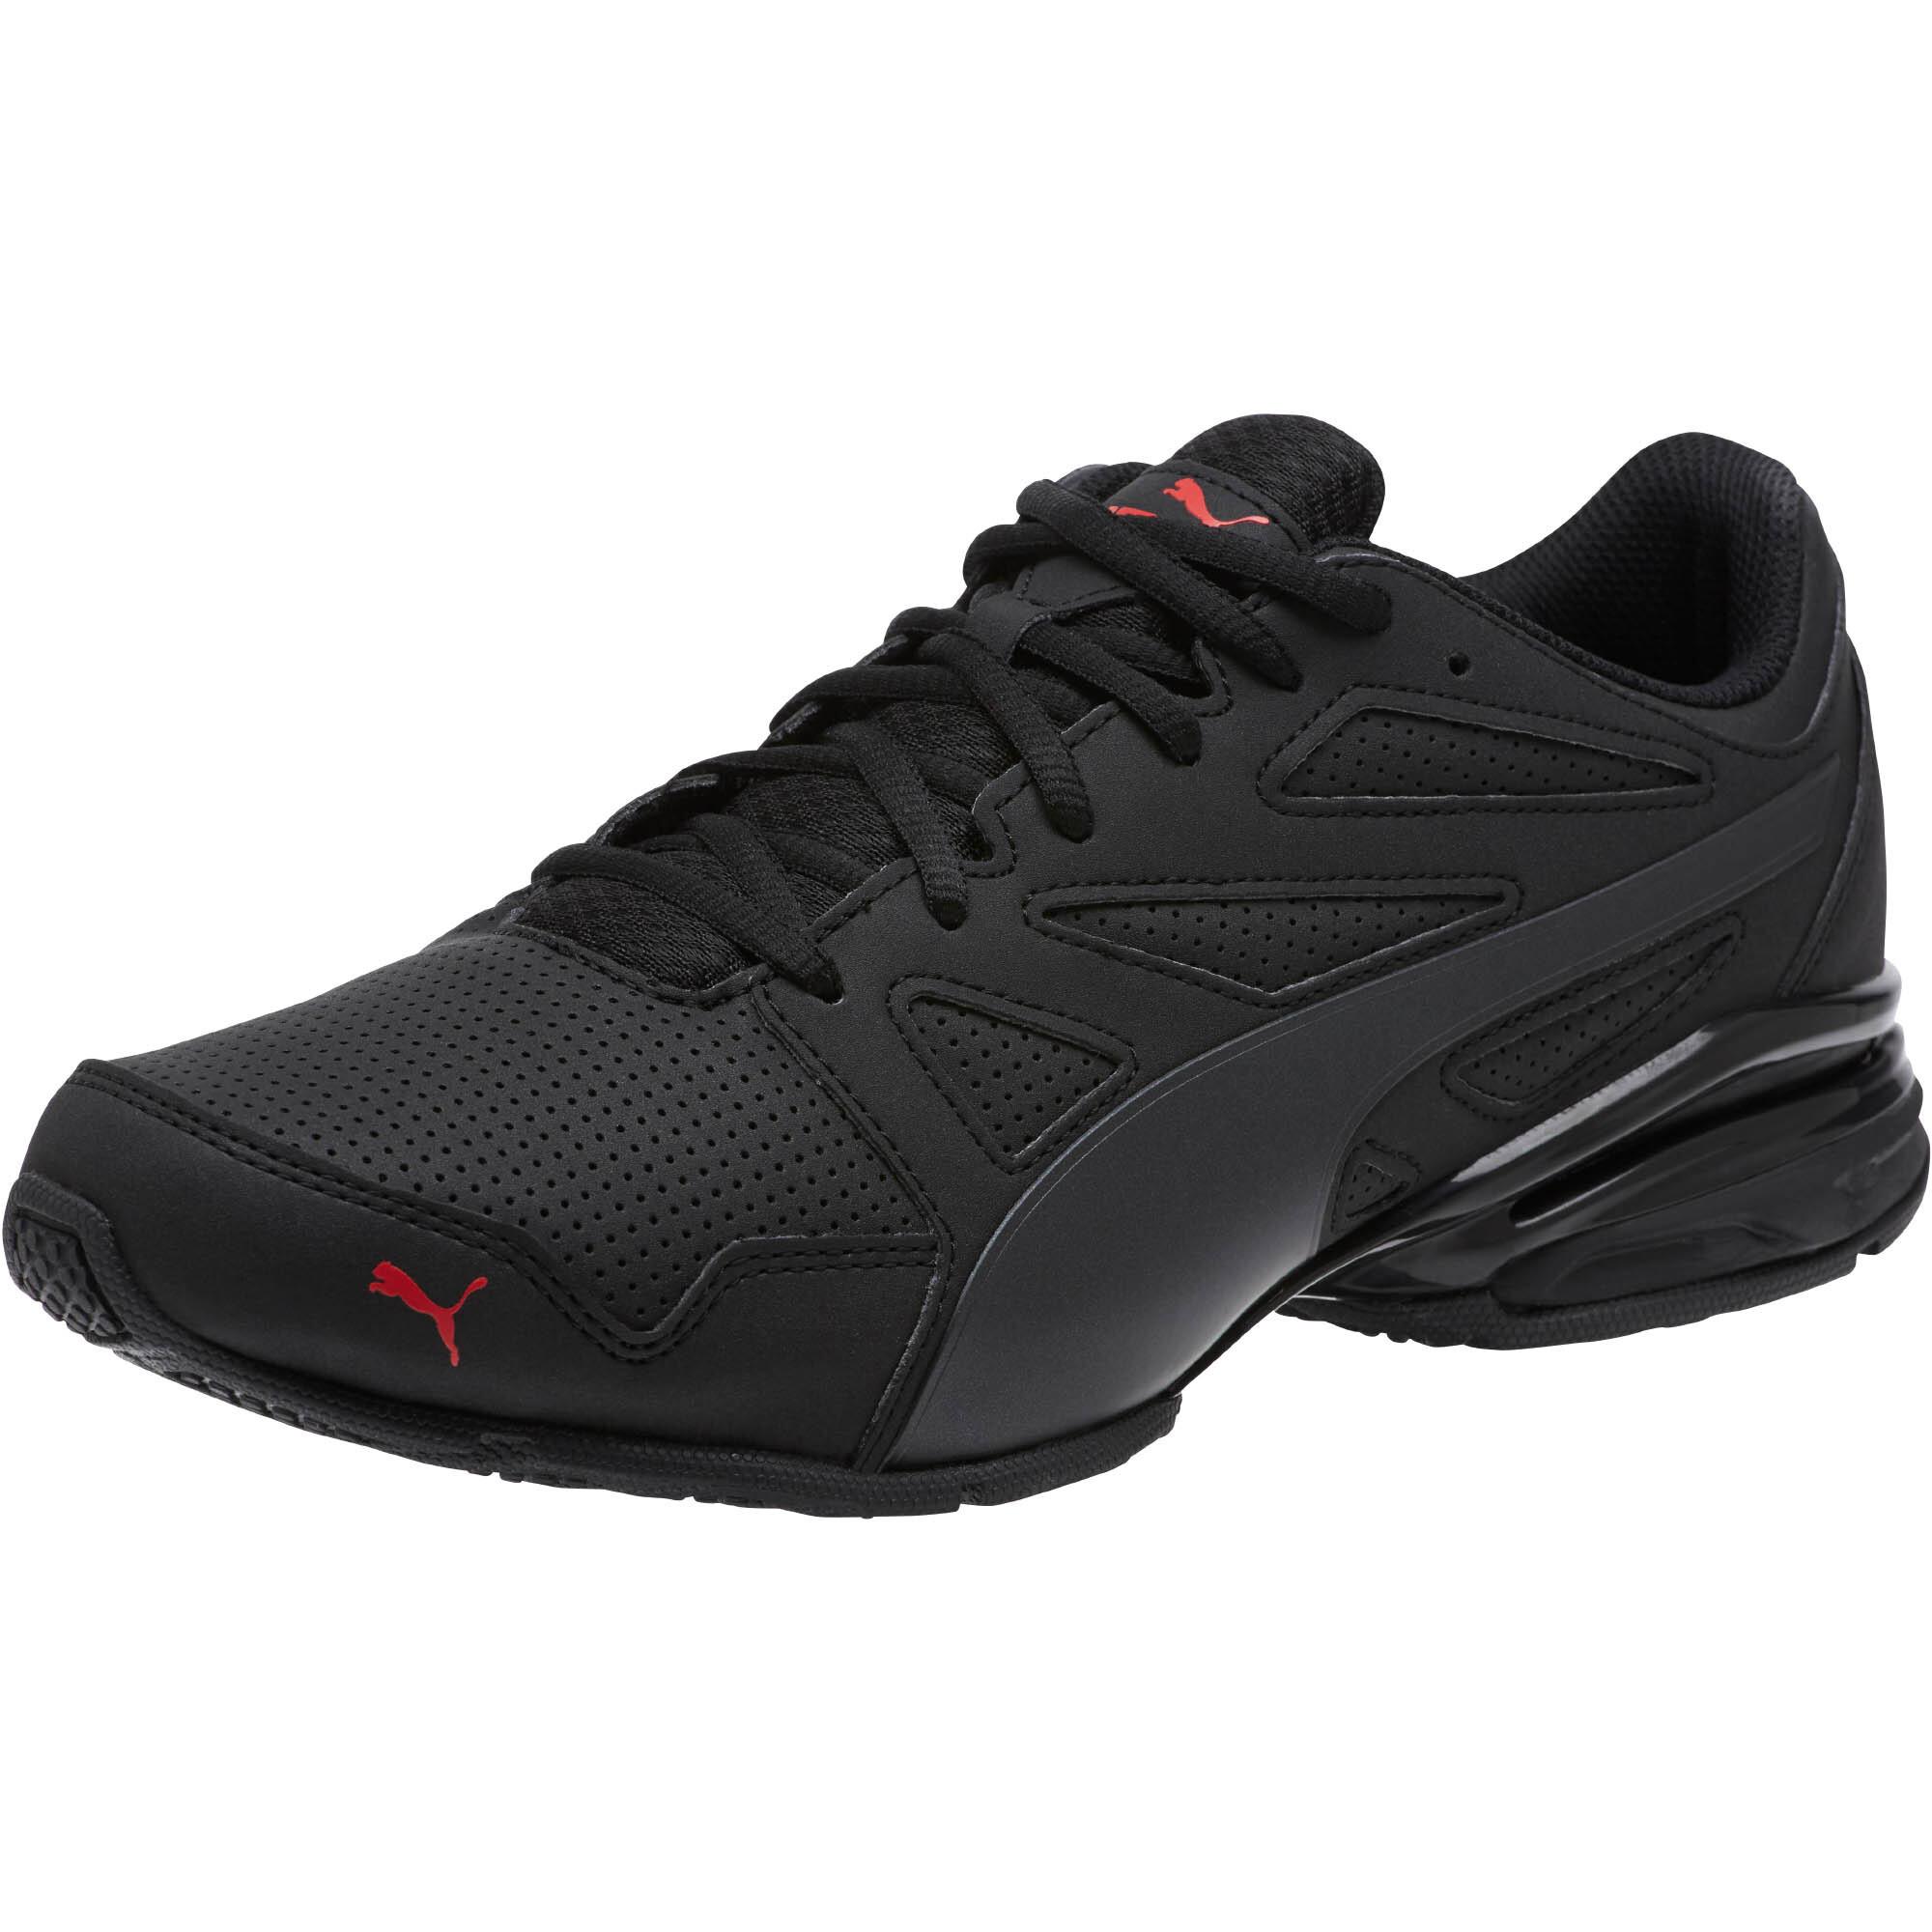 PUMA-Tazon-Modern-SL-FM-Men-039-s-Sneakers-Men-Shoe-Running thumbnail 4